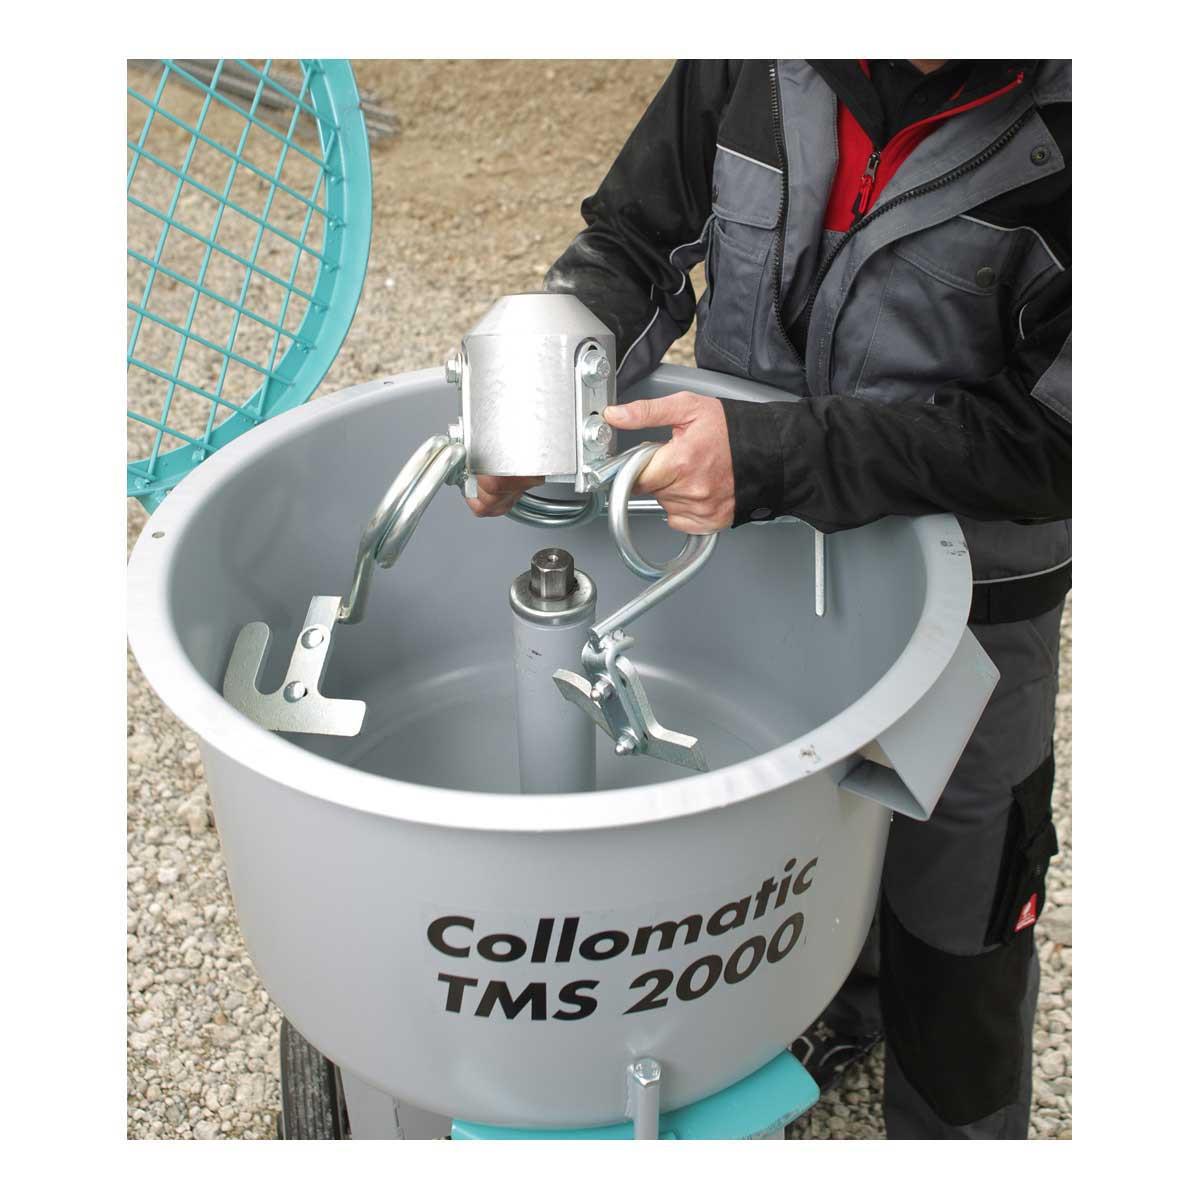 Collomix Mortar Mixer paddle remove